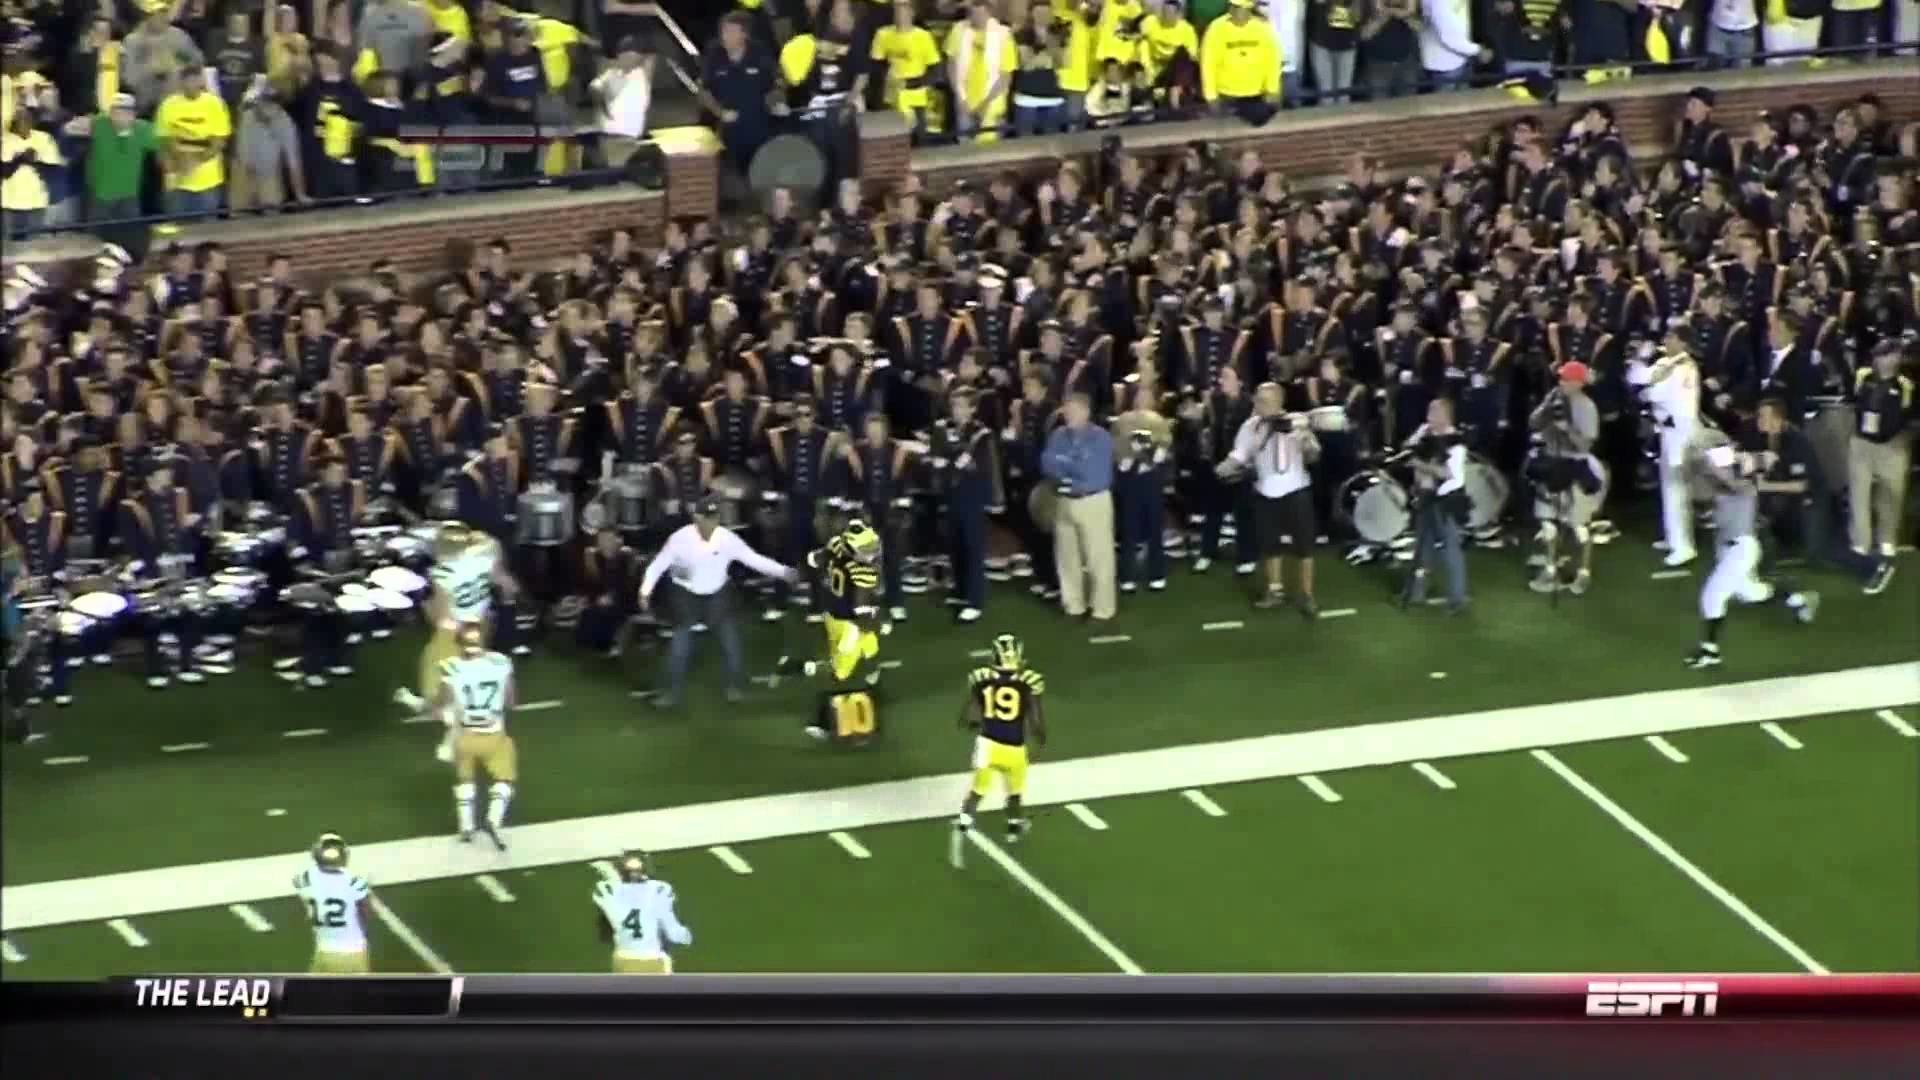 Michigan Wolverines Football: Michigan Wolverines vs. Notre Dame Fighting  Irish, 30 Seconds To Glory